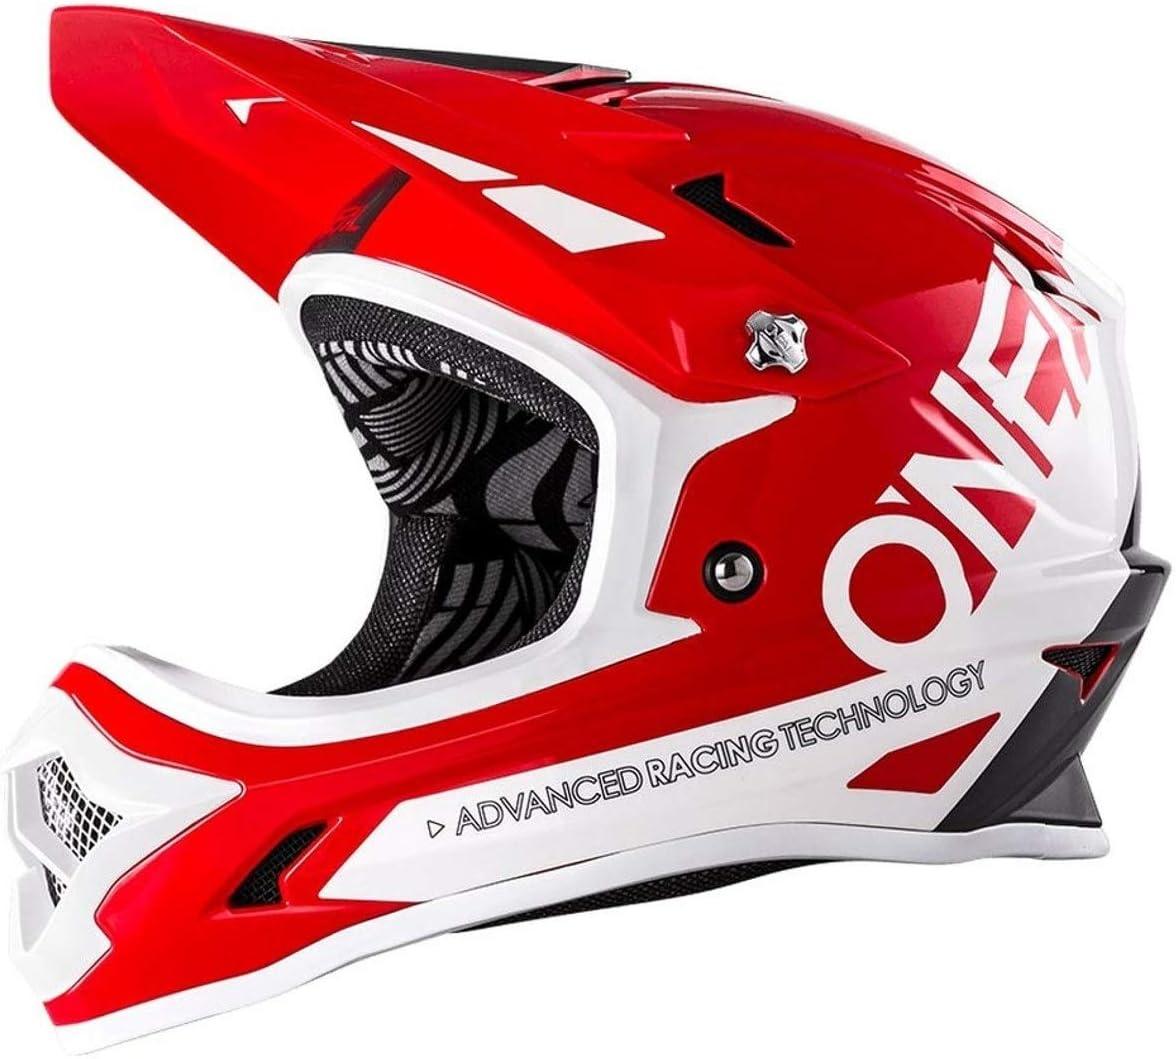 ONEAL Backflip RL2 Bungarra DH Fahrrad Helm rot//grau//wei/ß 2018 Oneal